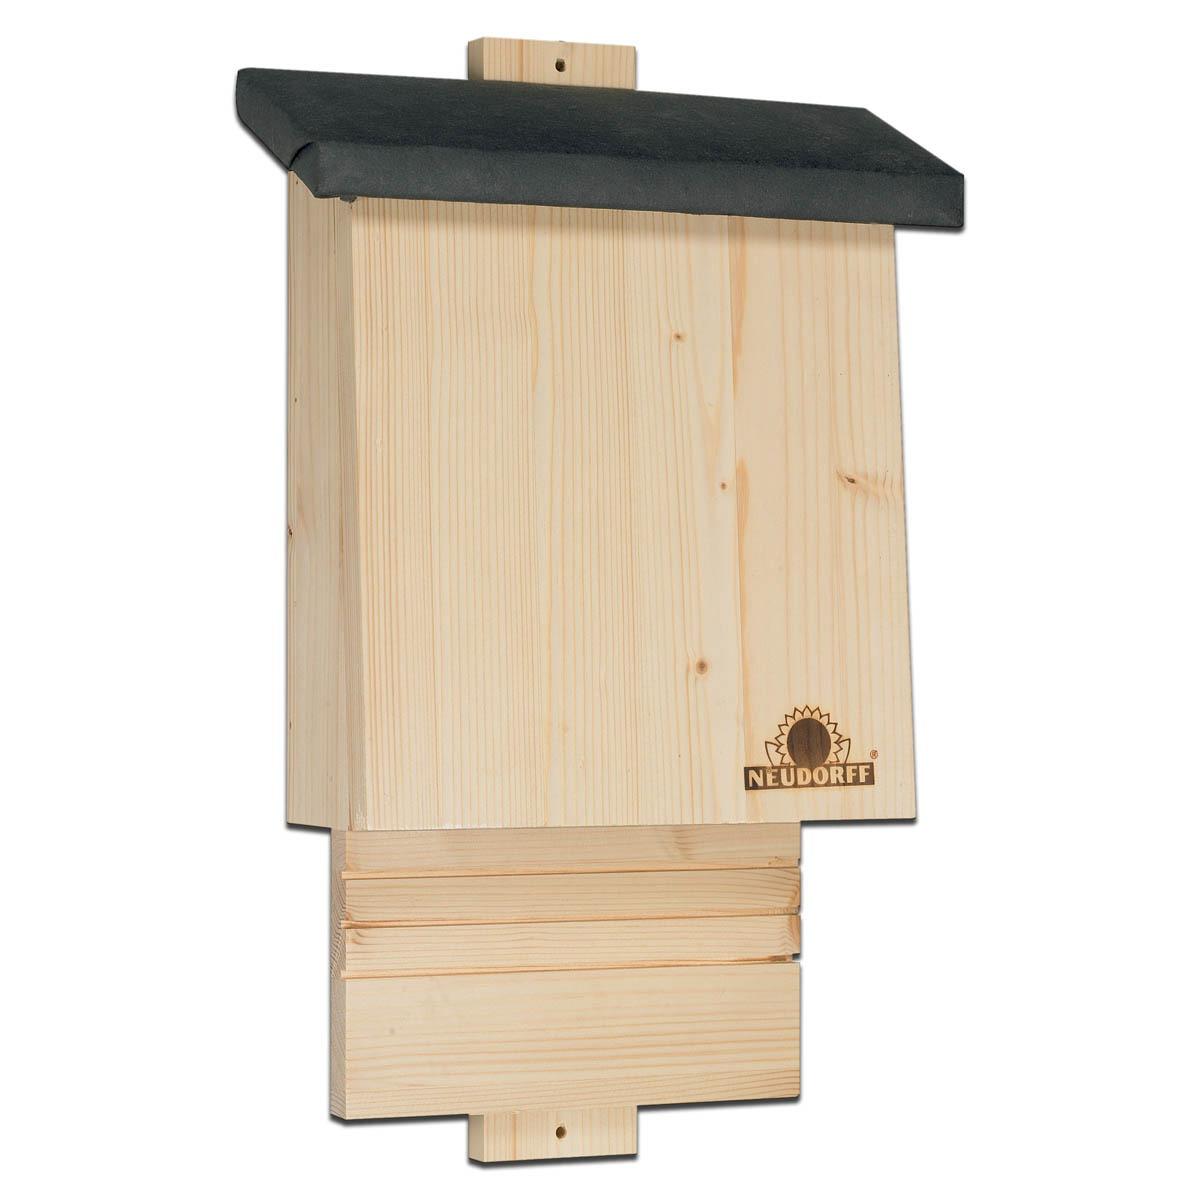 neudorff fledermausquartier fledermaushaus fledermausschutz flederm use sch tzen zuhause. Black Bedroom Furniture Sets. Home Design Ideas